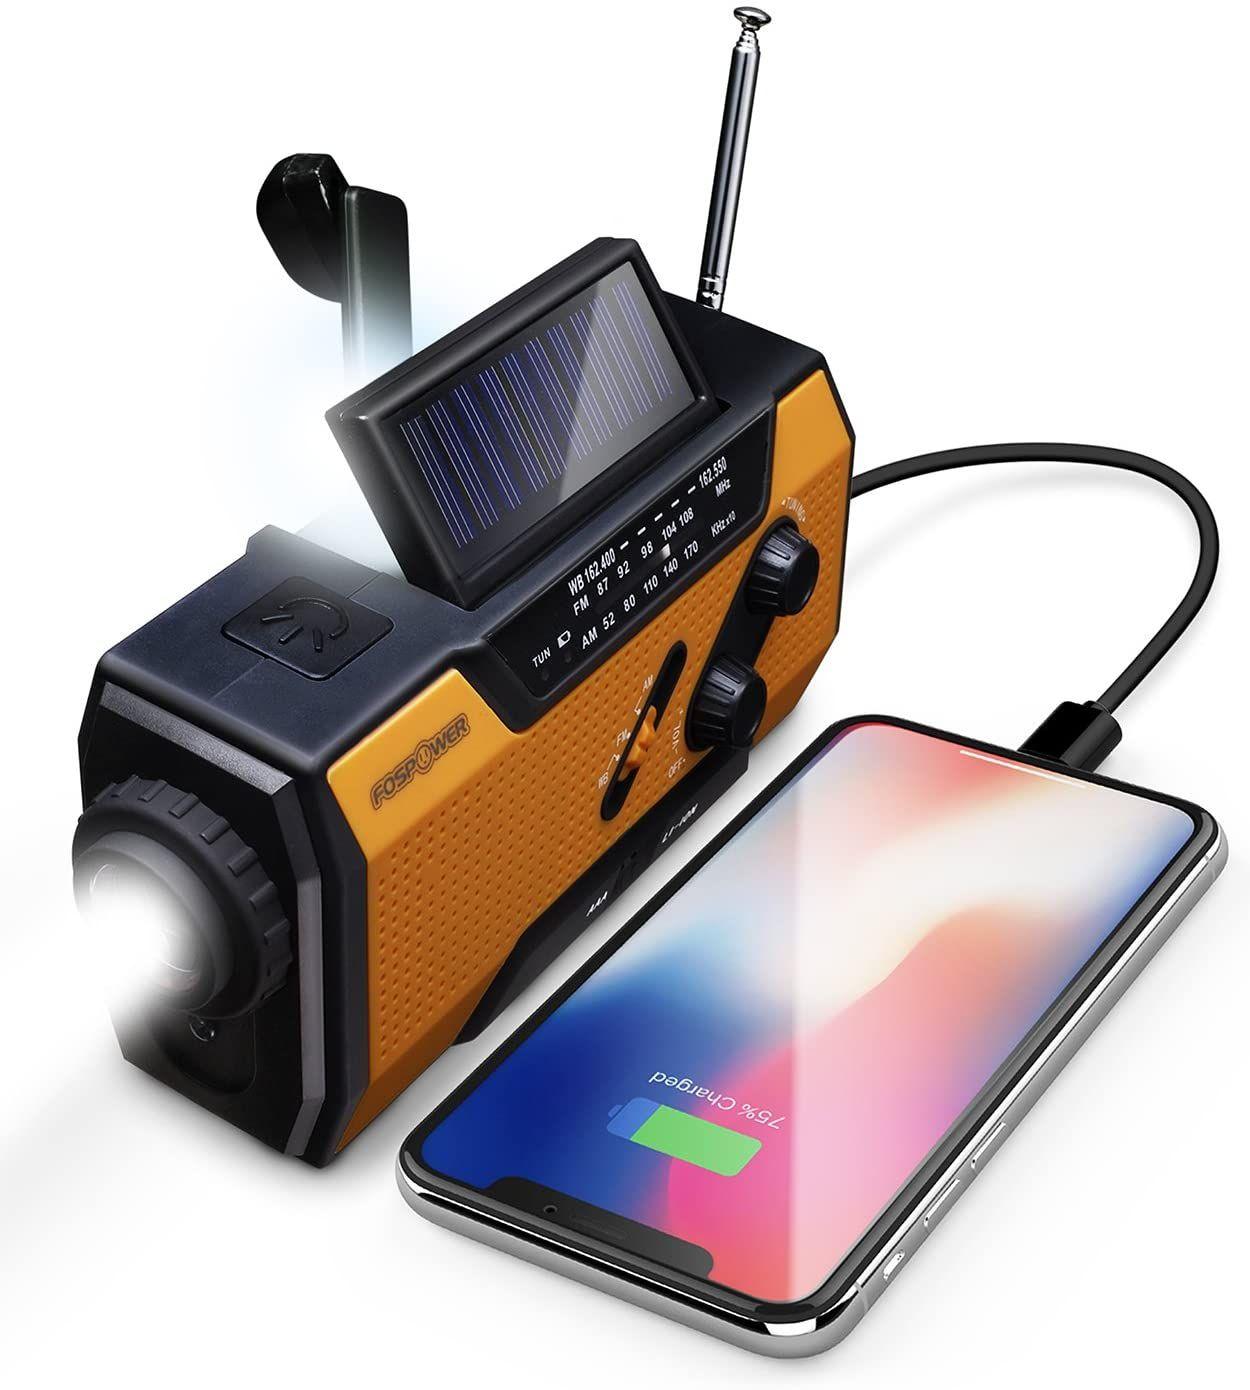 Radioemergency With Am Fm Led Flashlight Reading Lamp 2000mah Power Bank Usb Charger In 2020 Emergency Radio Noaa Weather Radio Weather Radio